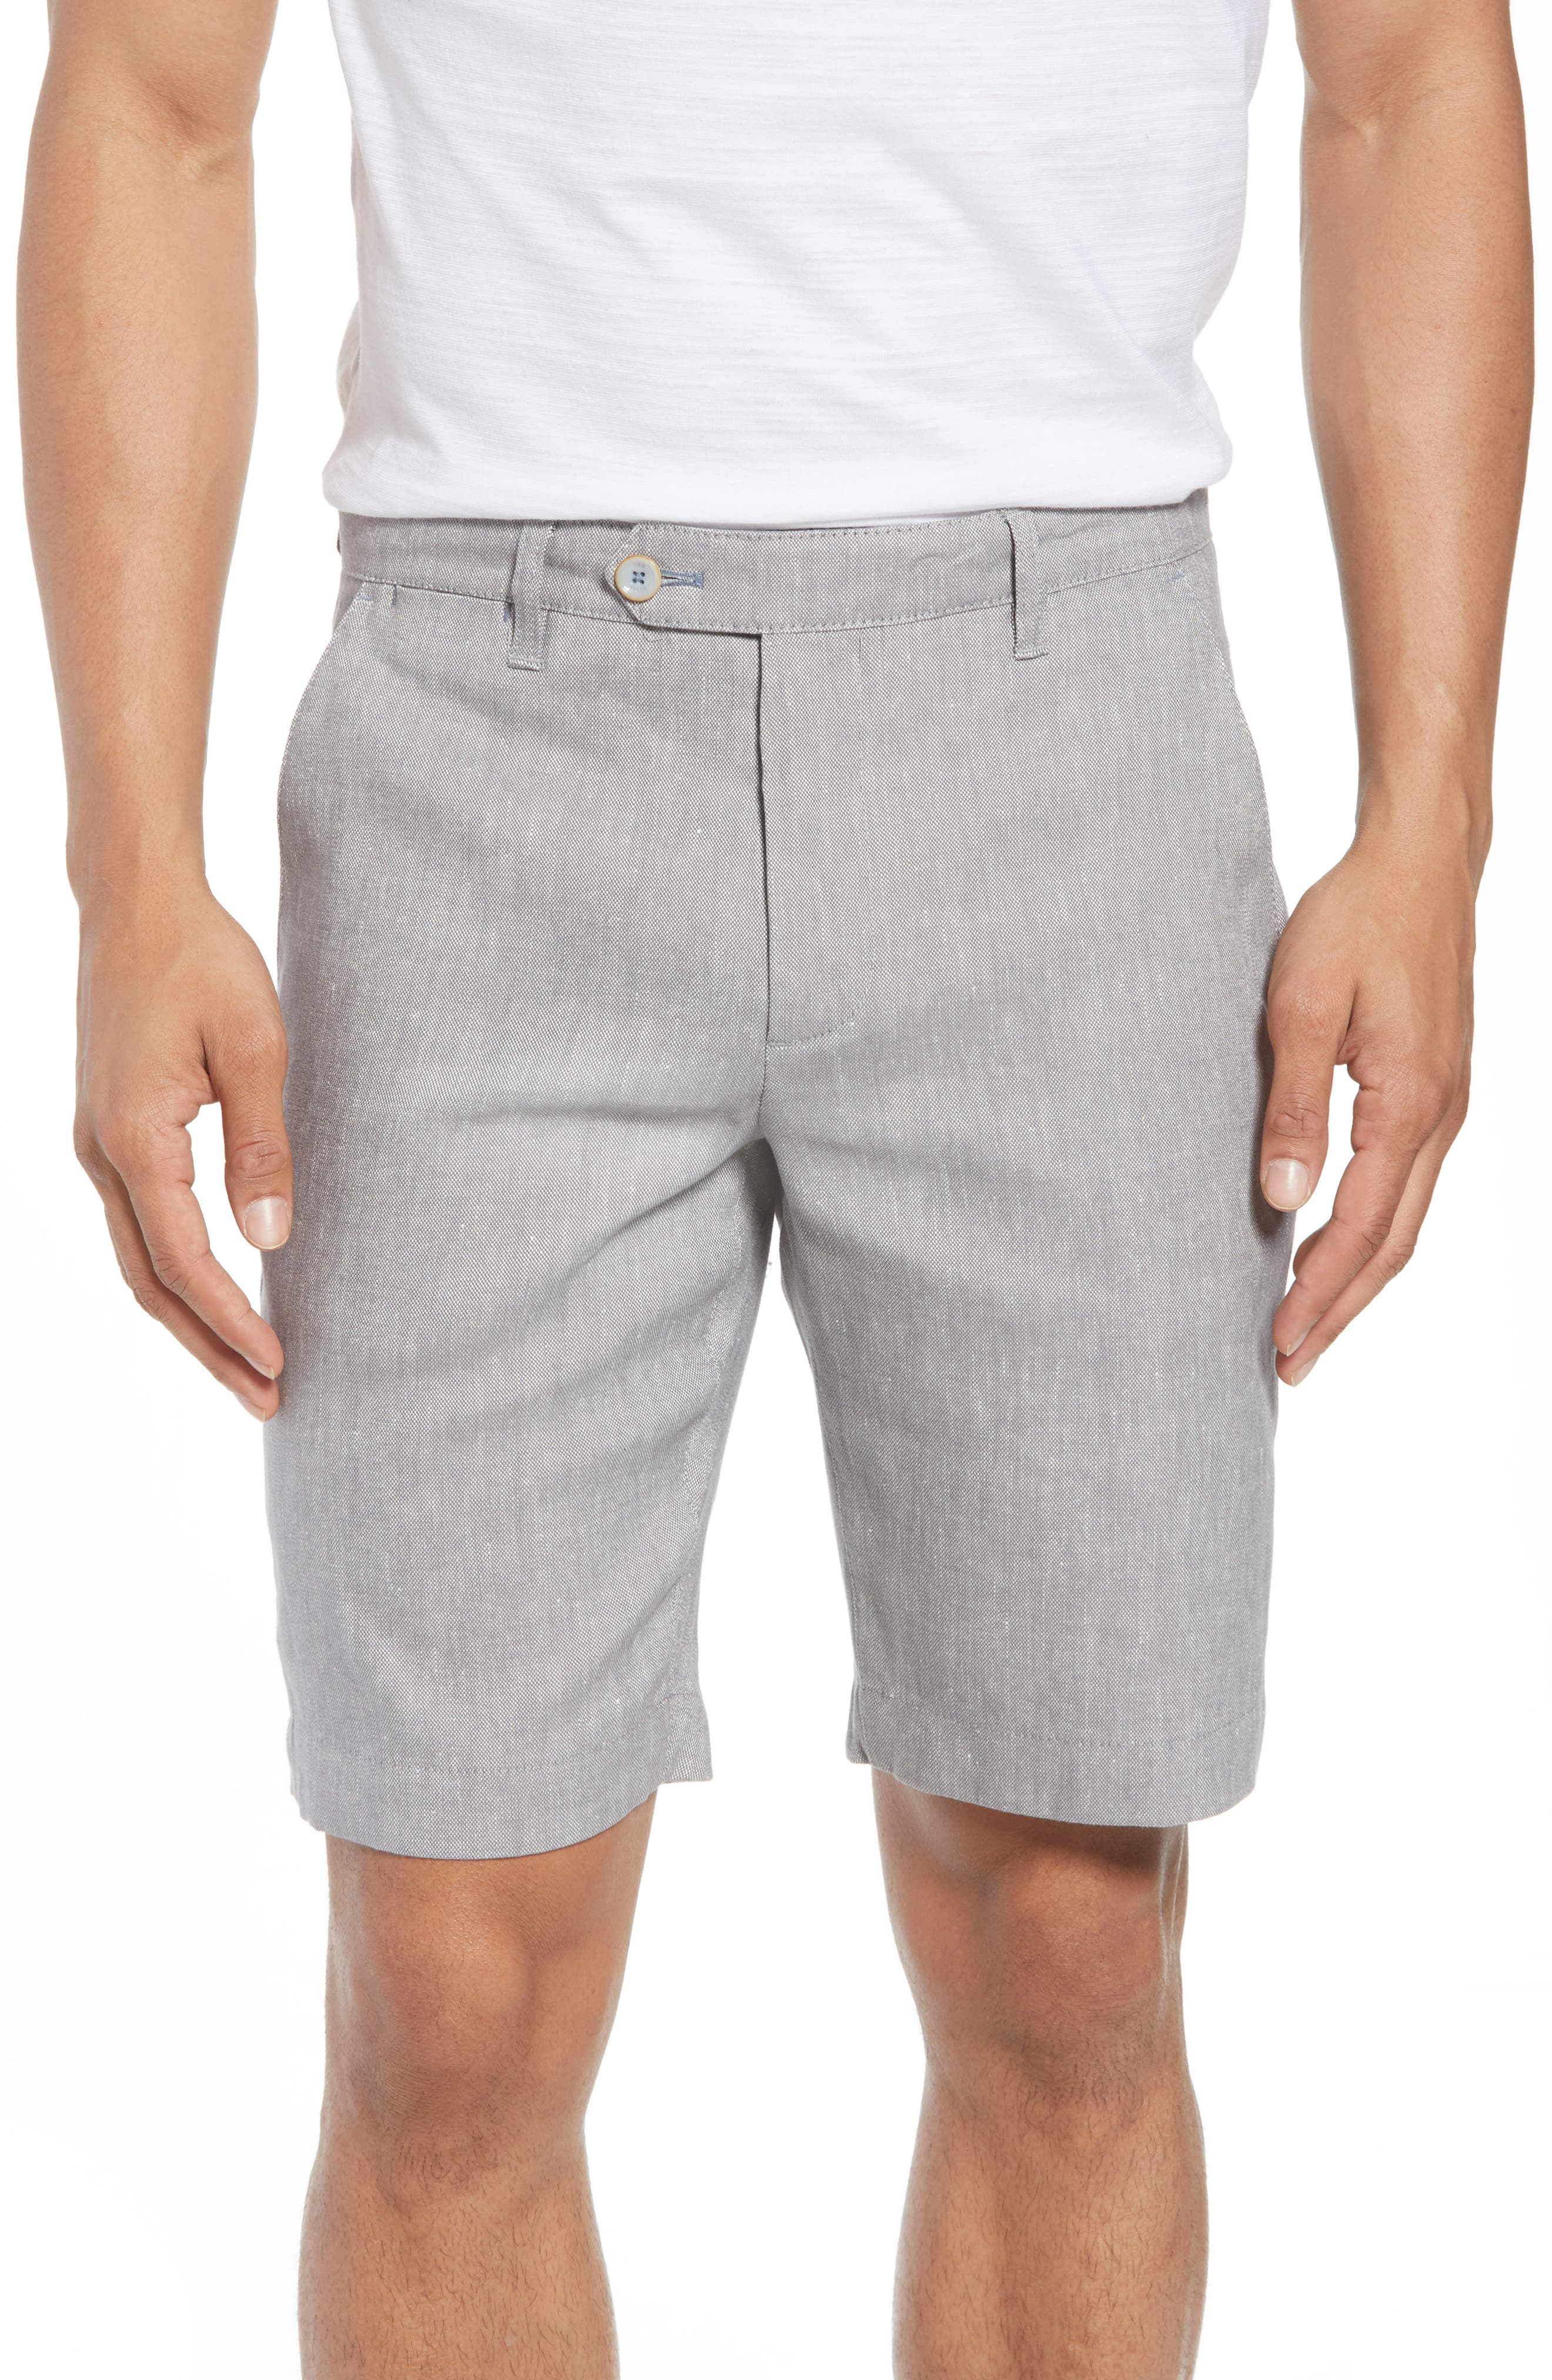 Newshow Flat Front Stretch Cotton Blend Shorts,                             Main thumbnail 1, color,                             GREY